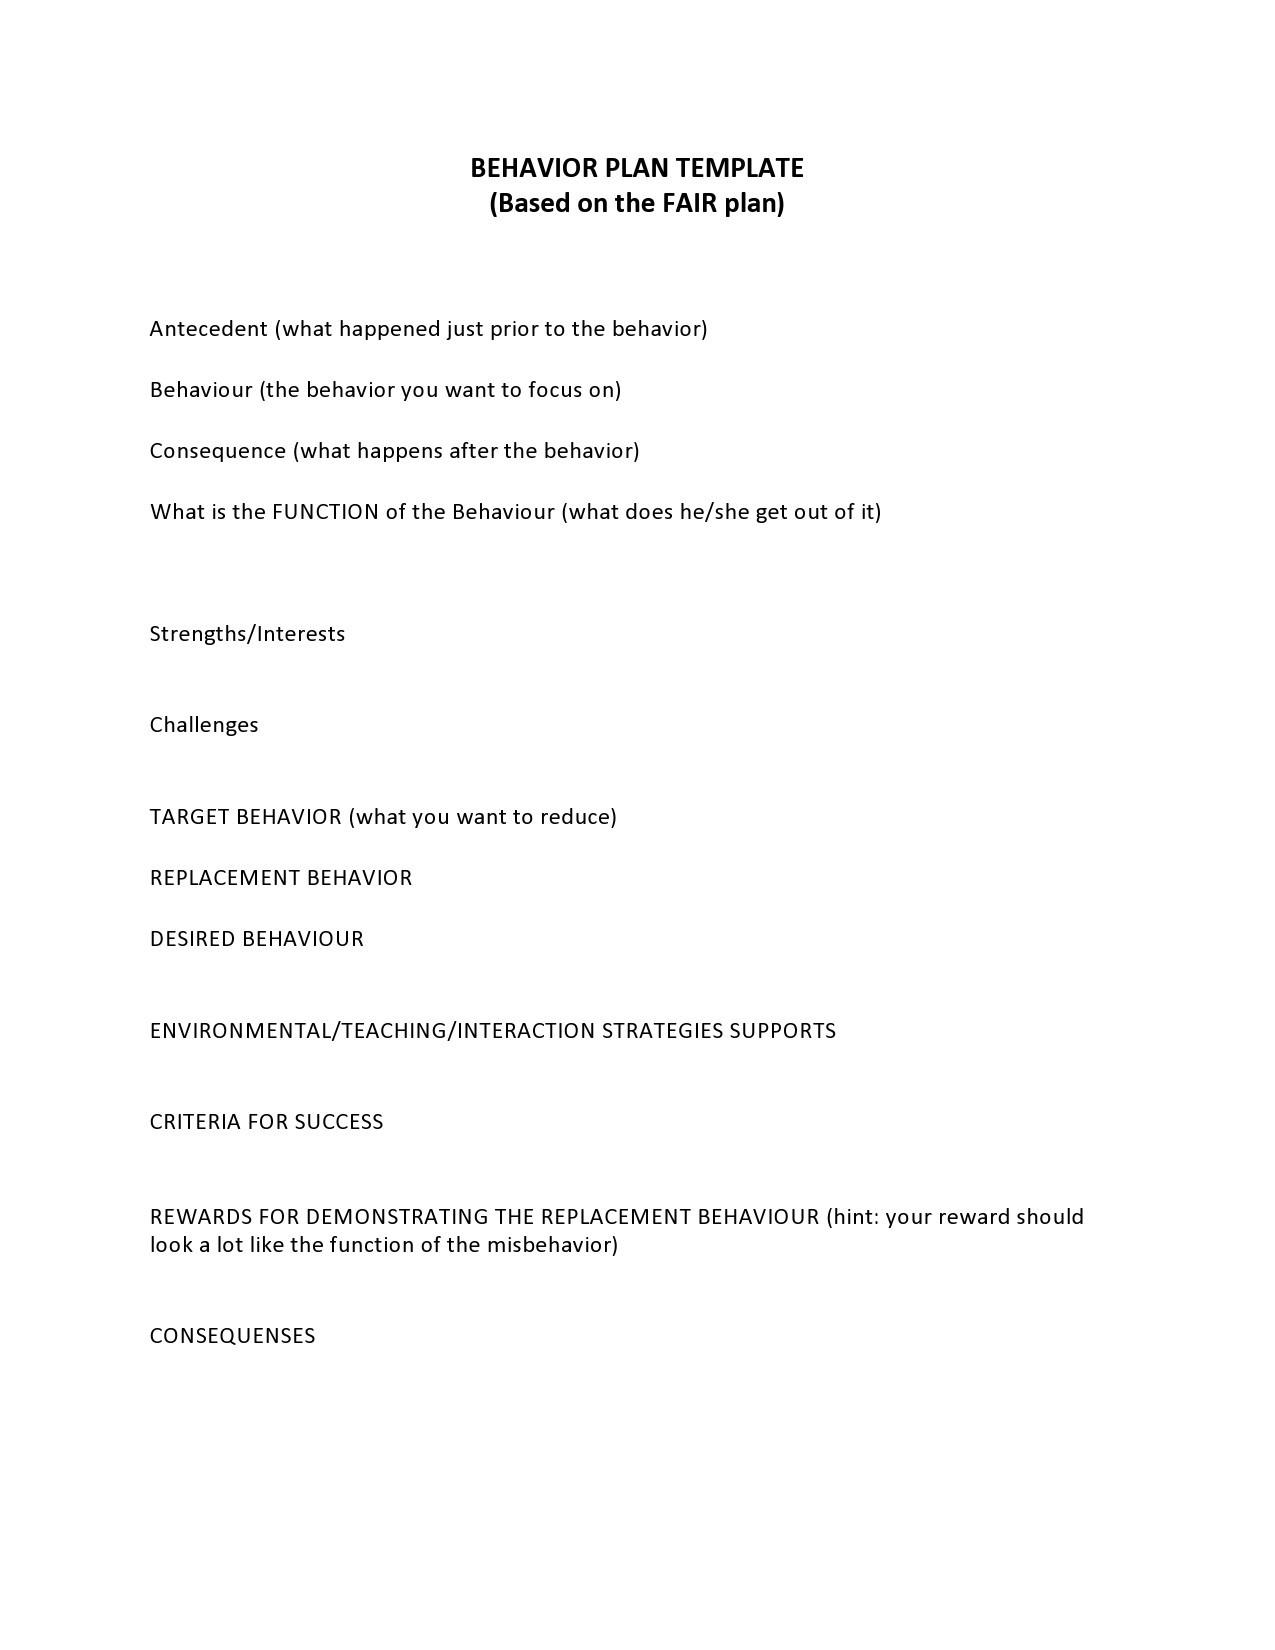 Free behavior plan template 13